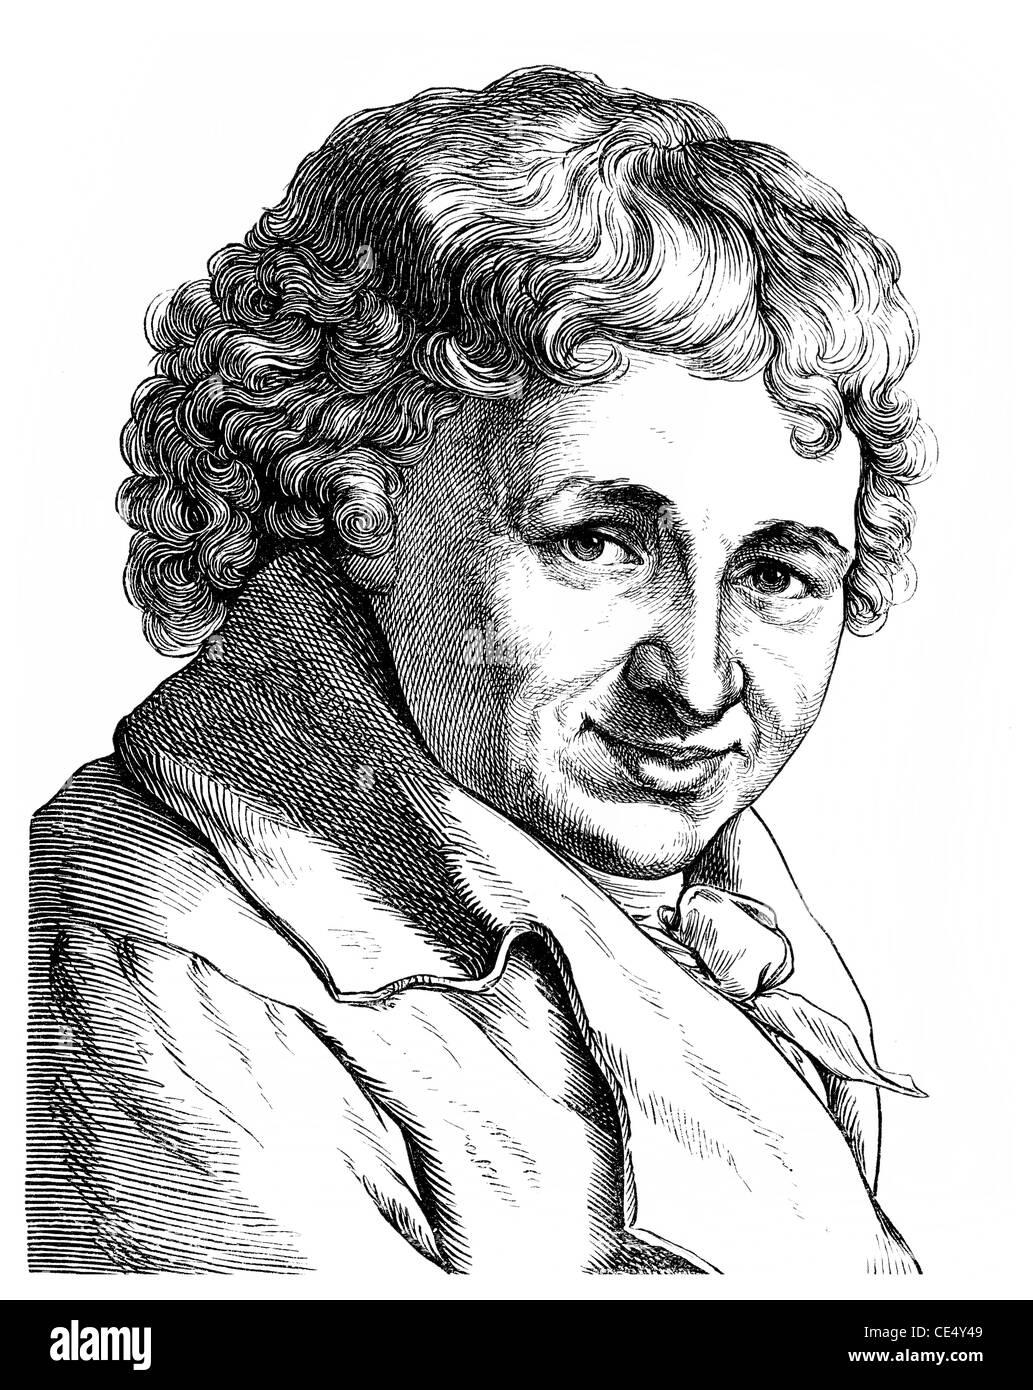 Daniel Nikolaus Chodowiecki, 1726 - 1801, a German engraver, printmaker and illustrator of the 18th century - Stock Image